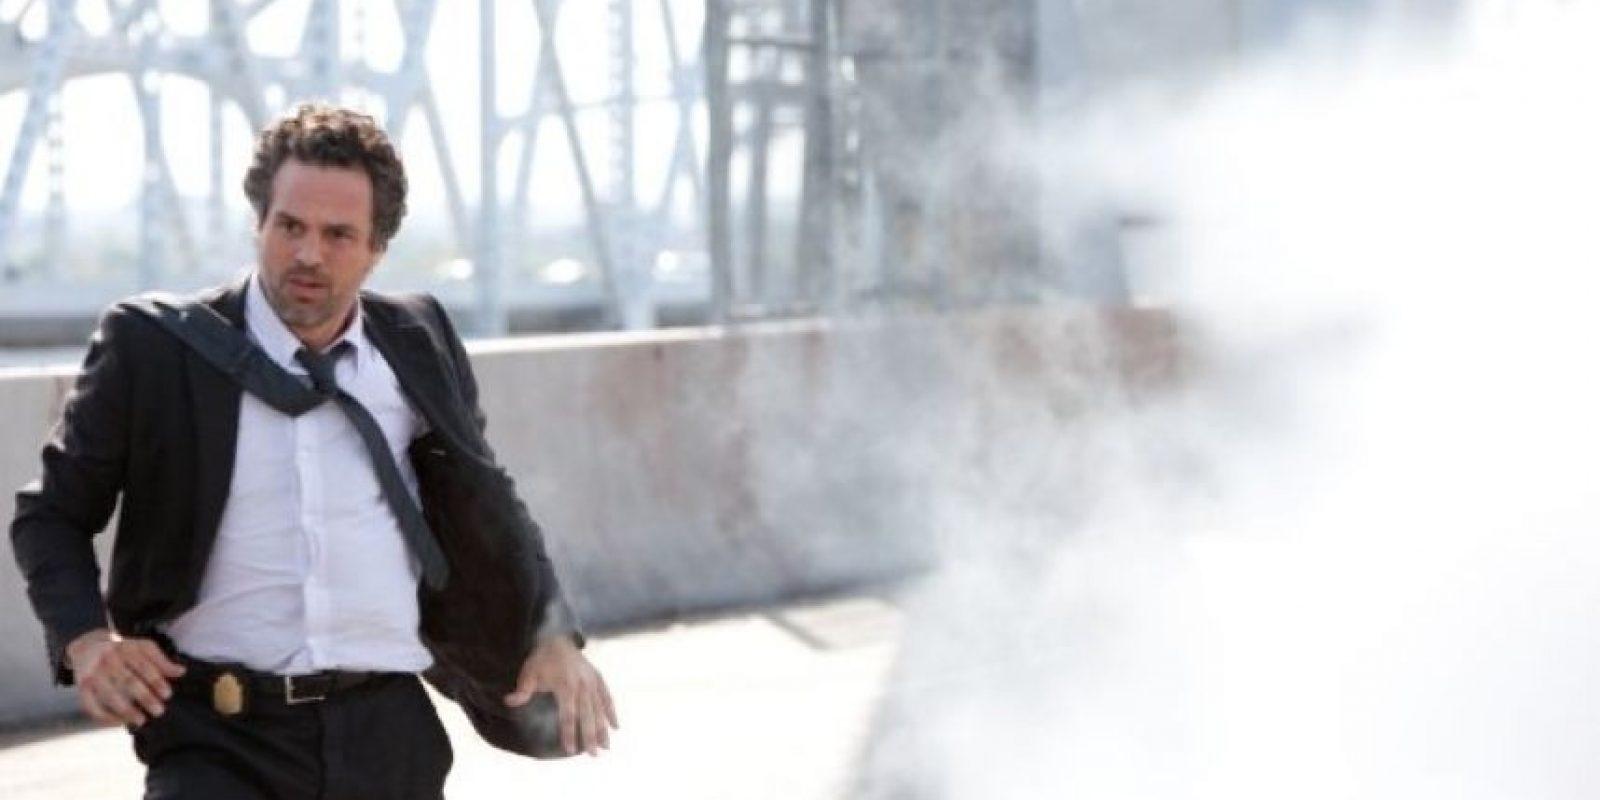 El elenco estará conformado por: Mark Ruffalo Foto:IMDb